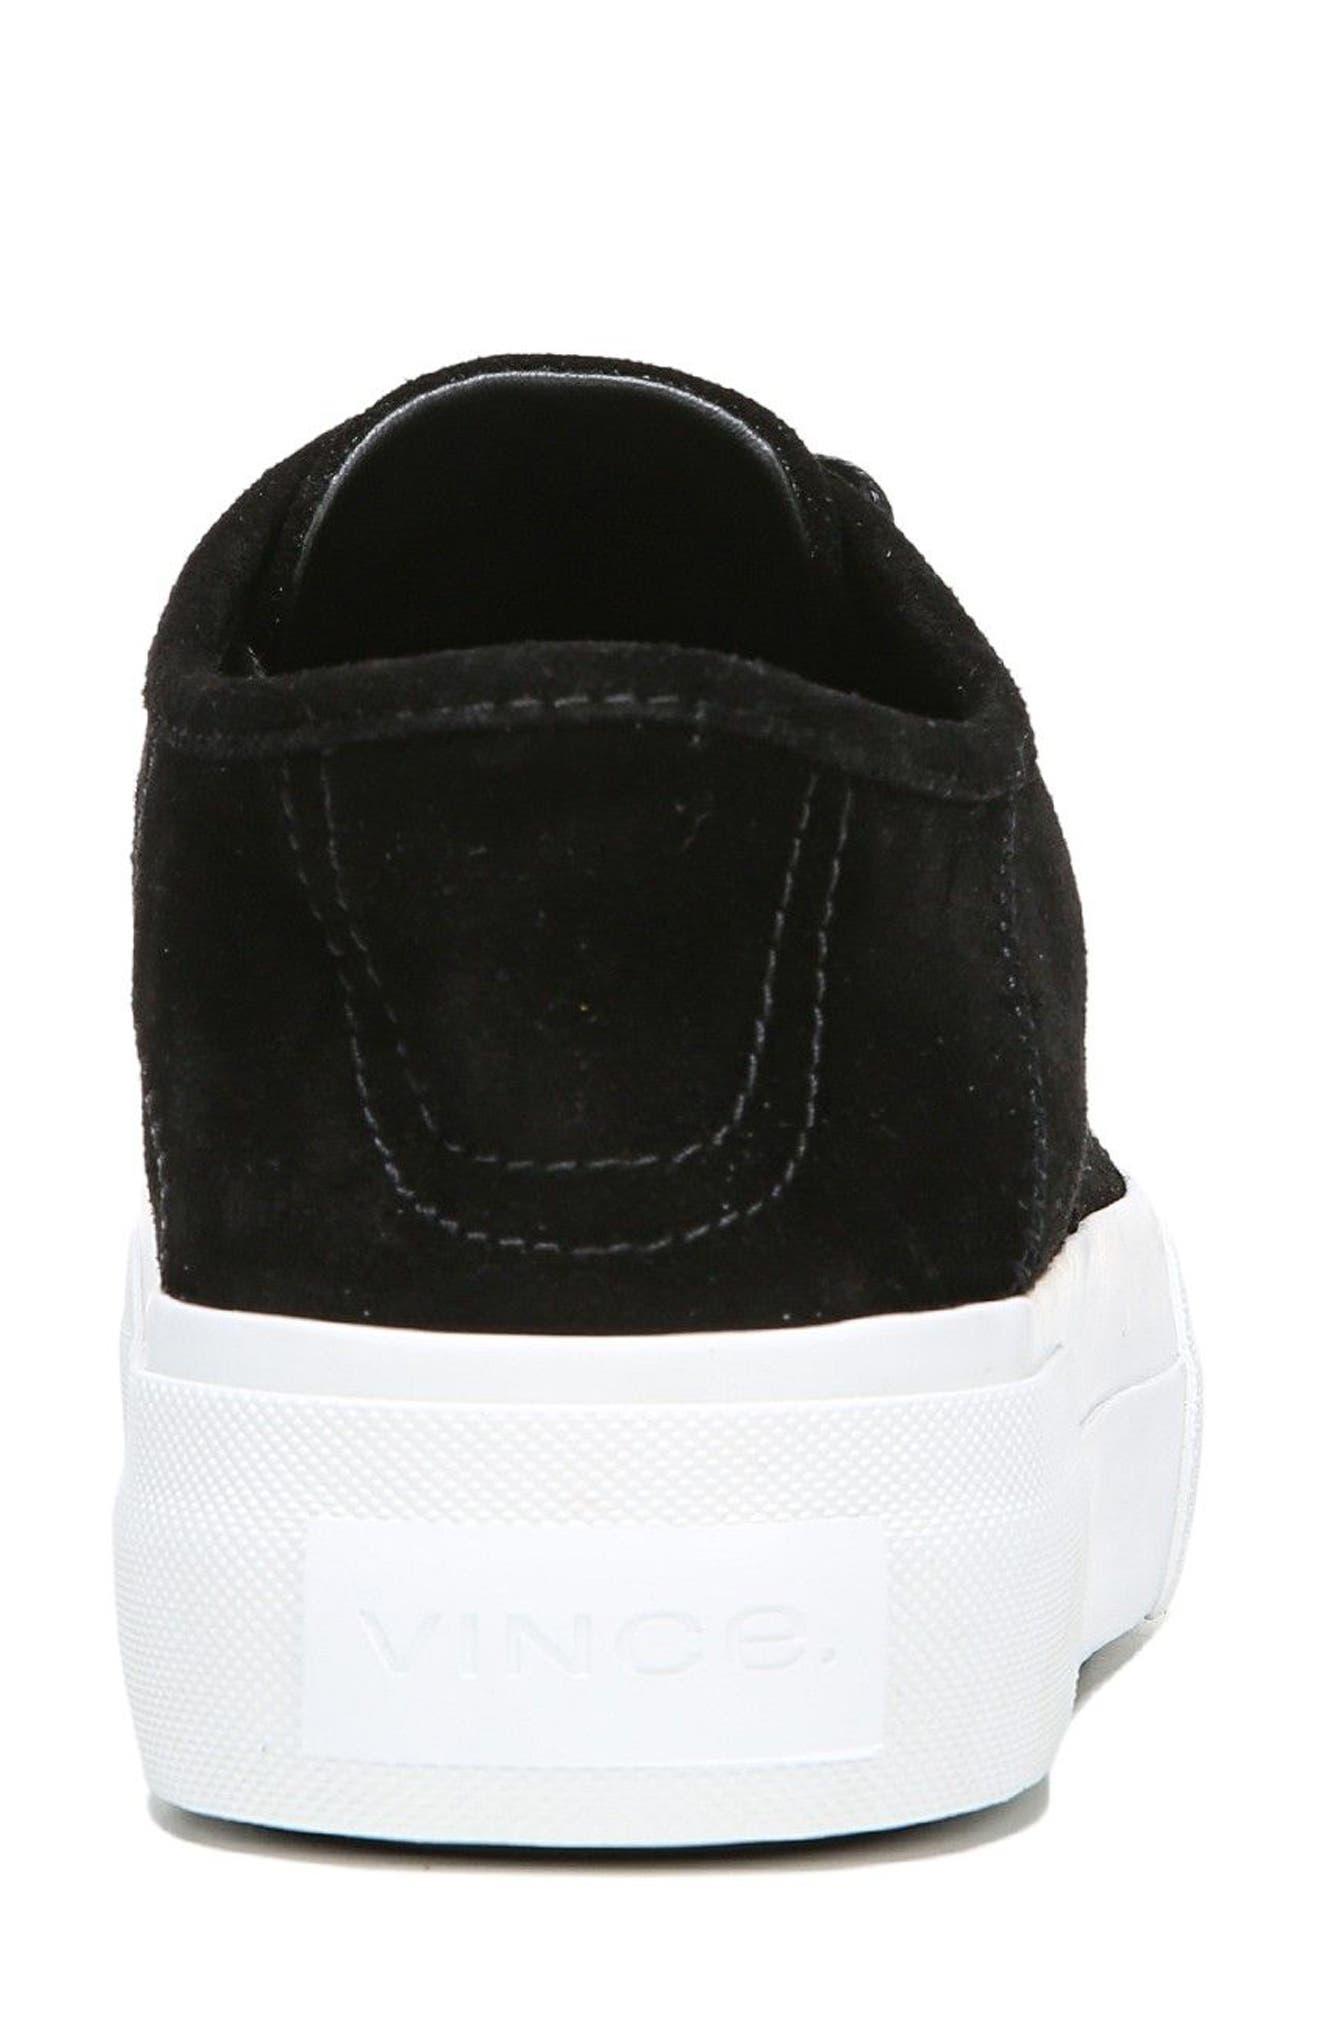 Copley Platform Sneaker,                             Alternate thumbnail 7, color,                             001